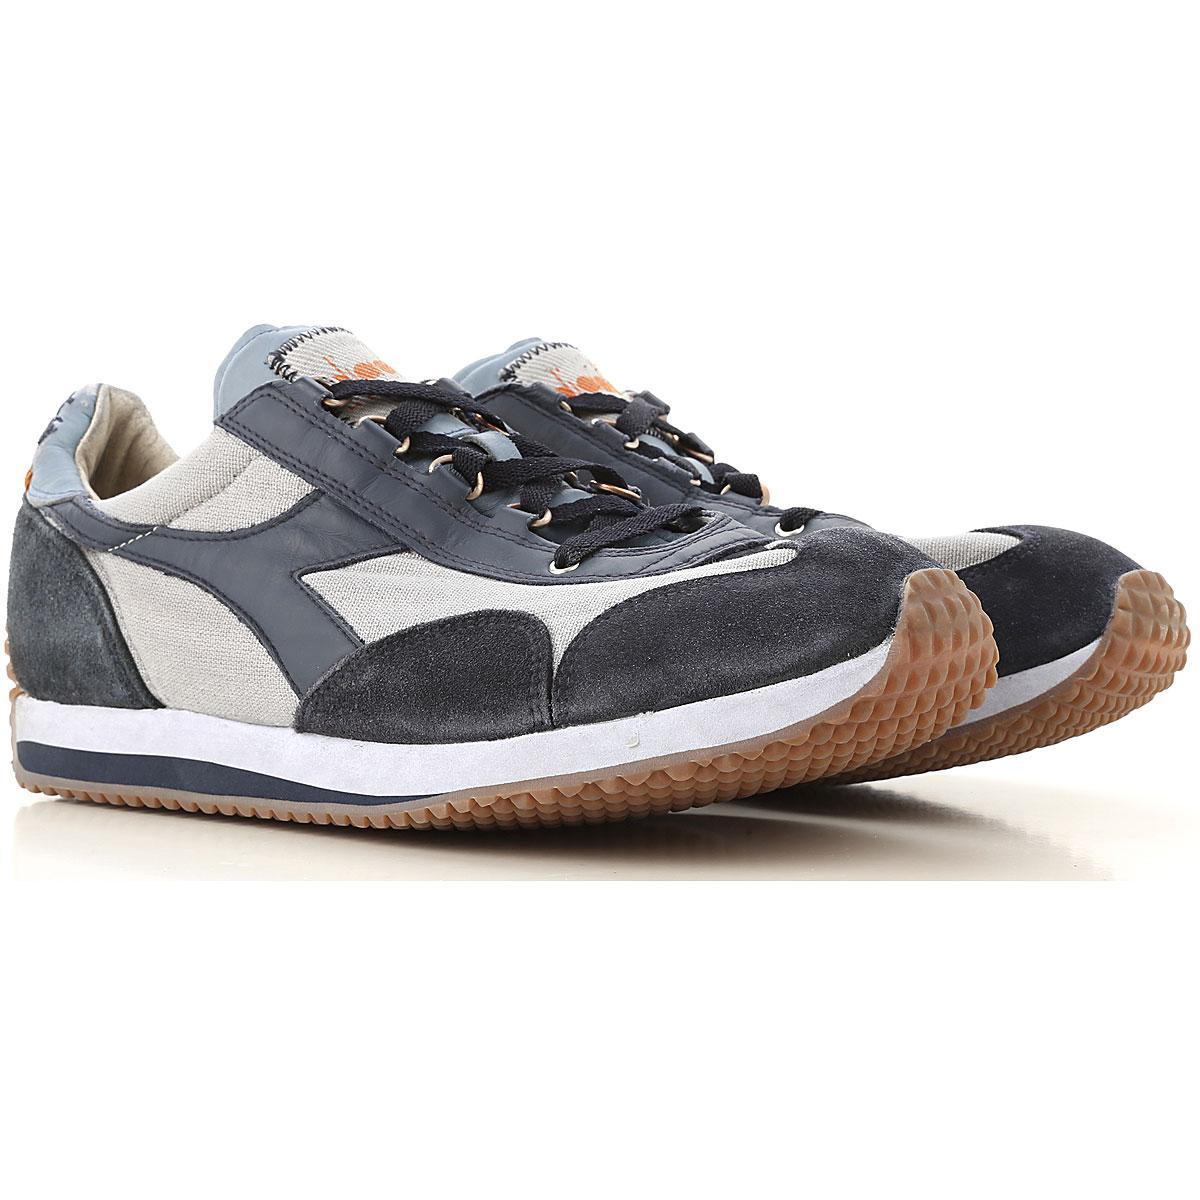 e116b205 Diadora Shoes For Men in Blue for Men - Lyst